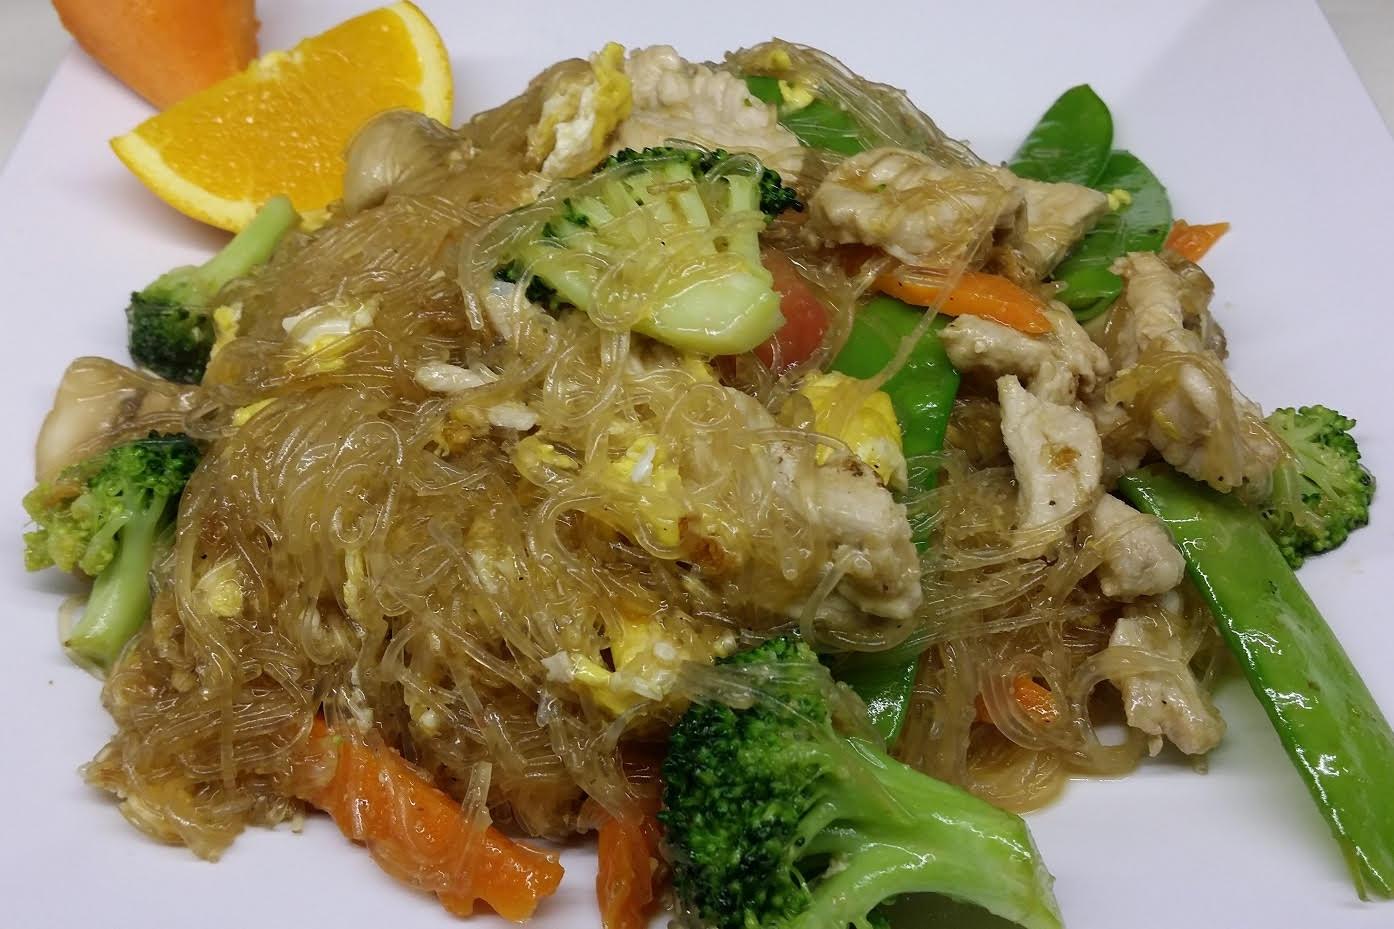 Pad Woon Sen - Stir fried Clear Noodles, Egg, Onion, Scallion, Mushroom, Broccoli, Carrot, Snow Pea and Tomato.